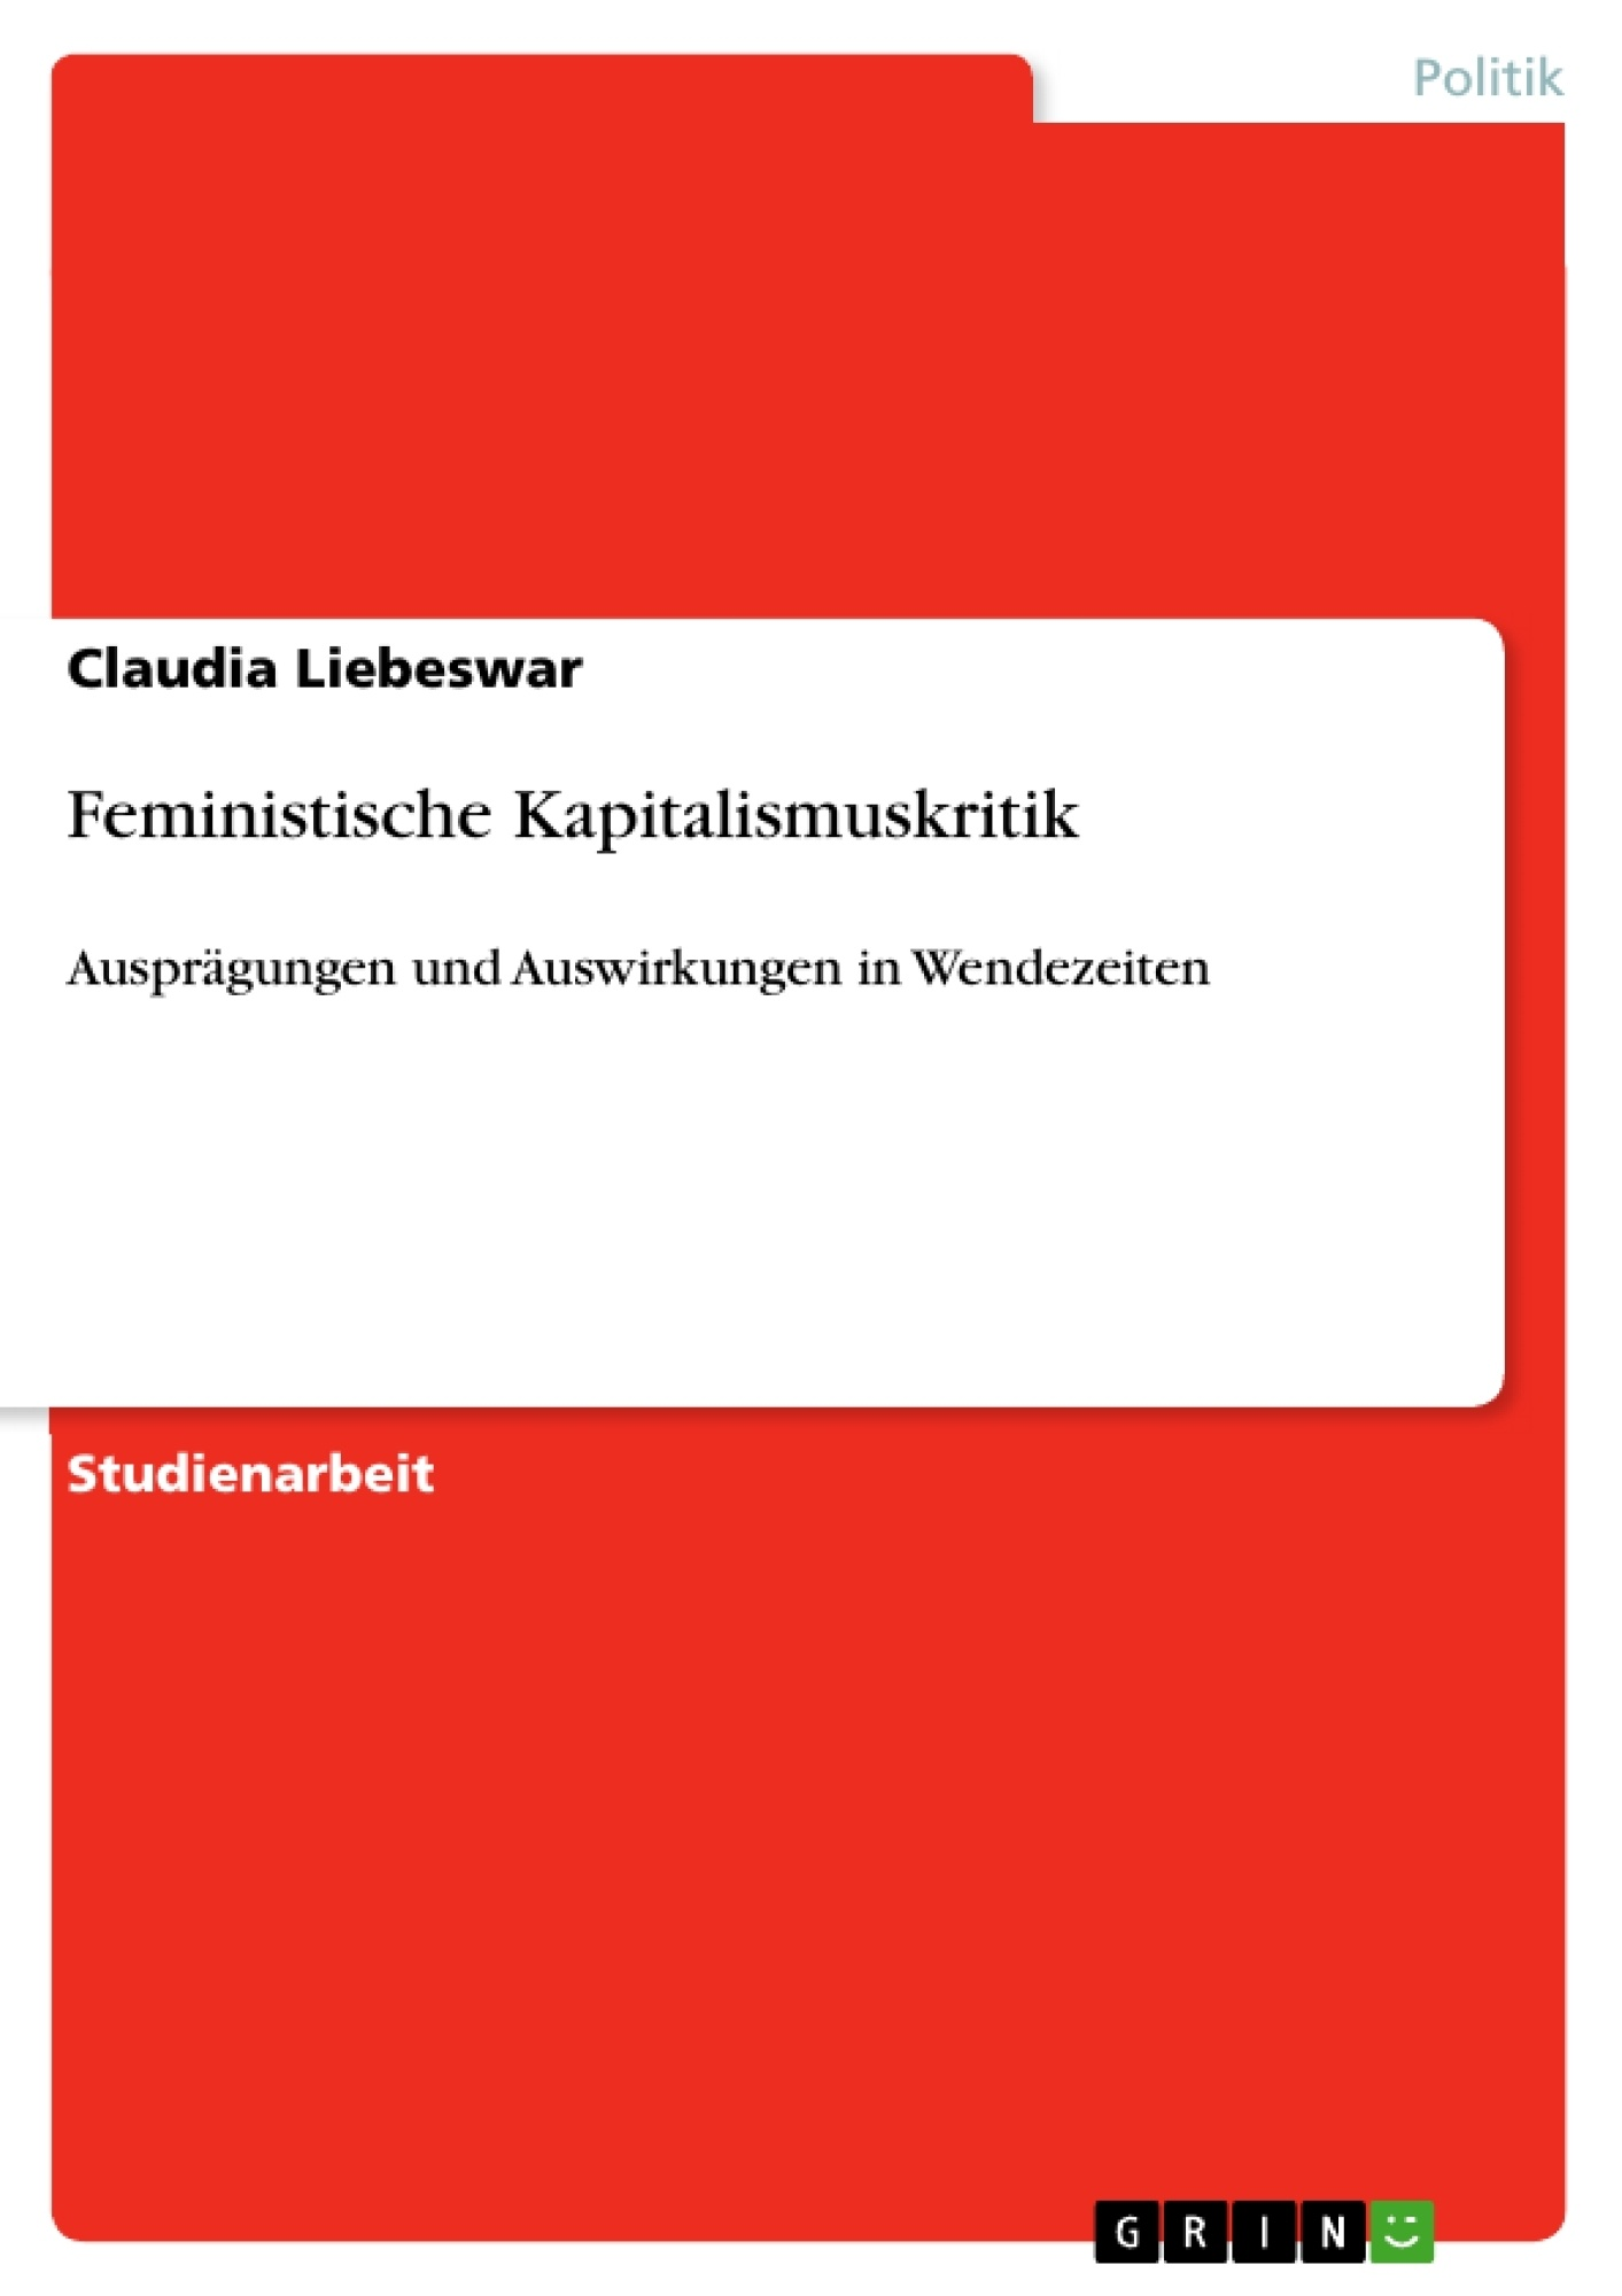 Titel: Feministische Kapitalismuskritik